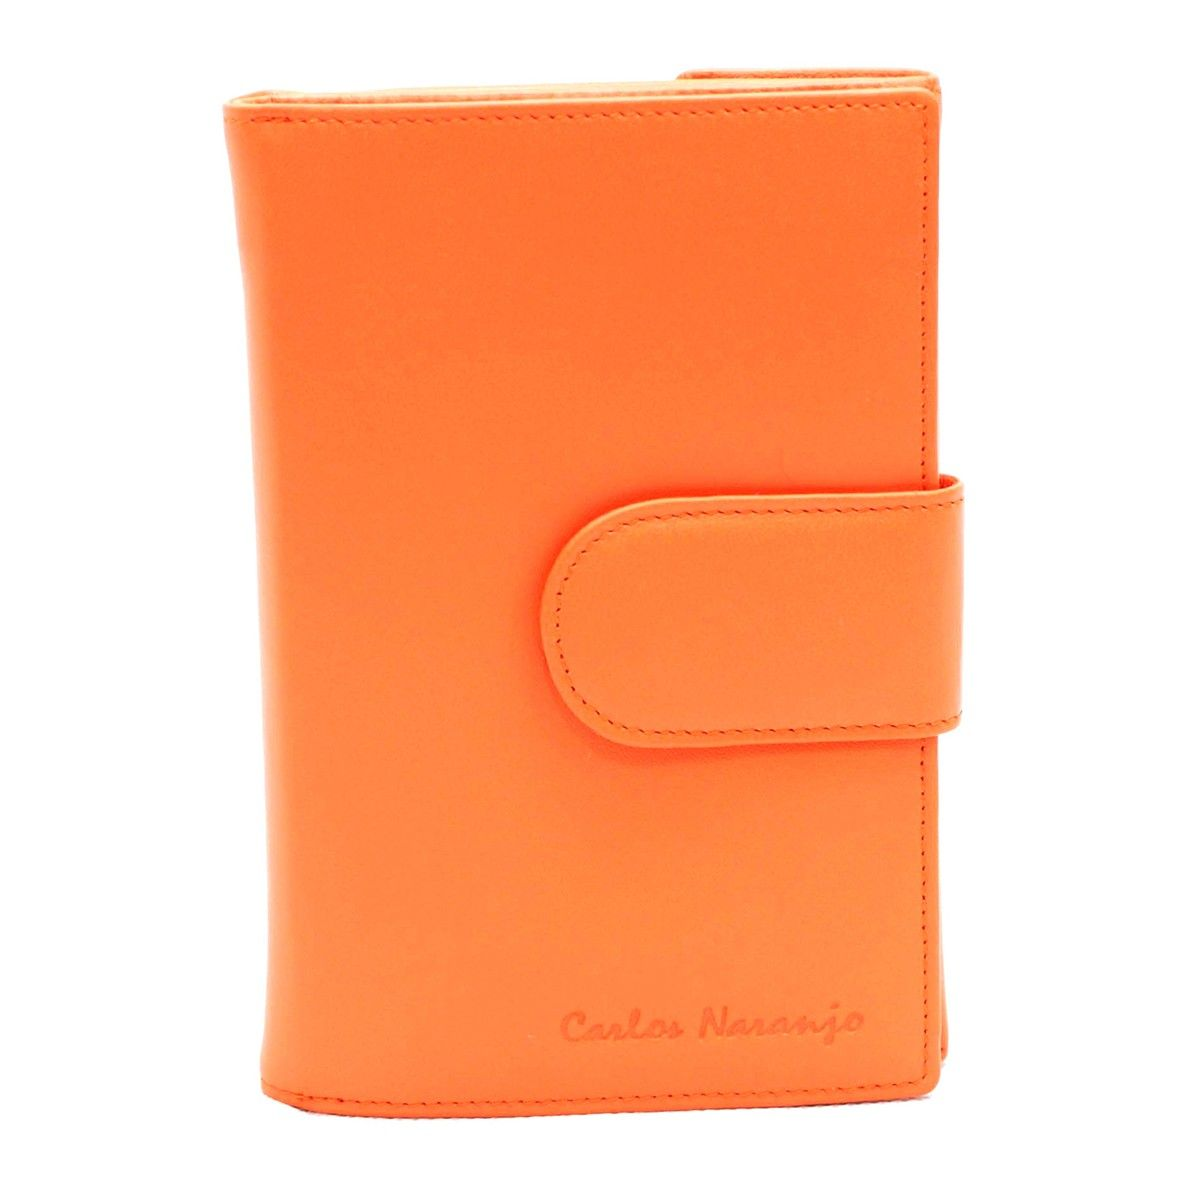 billetero piel napa naranja- naranjo ubrique